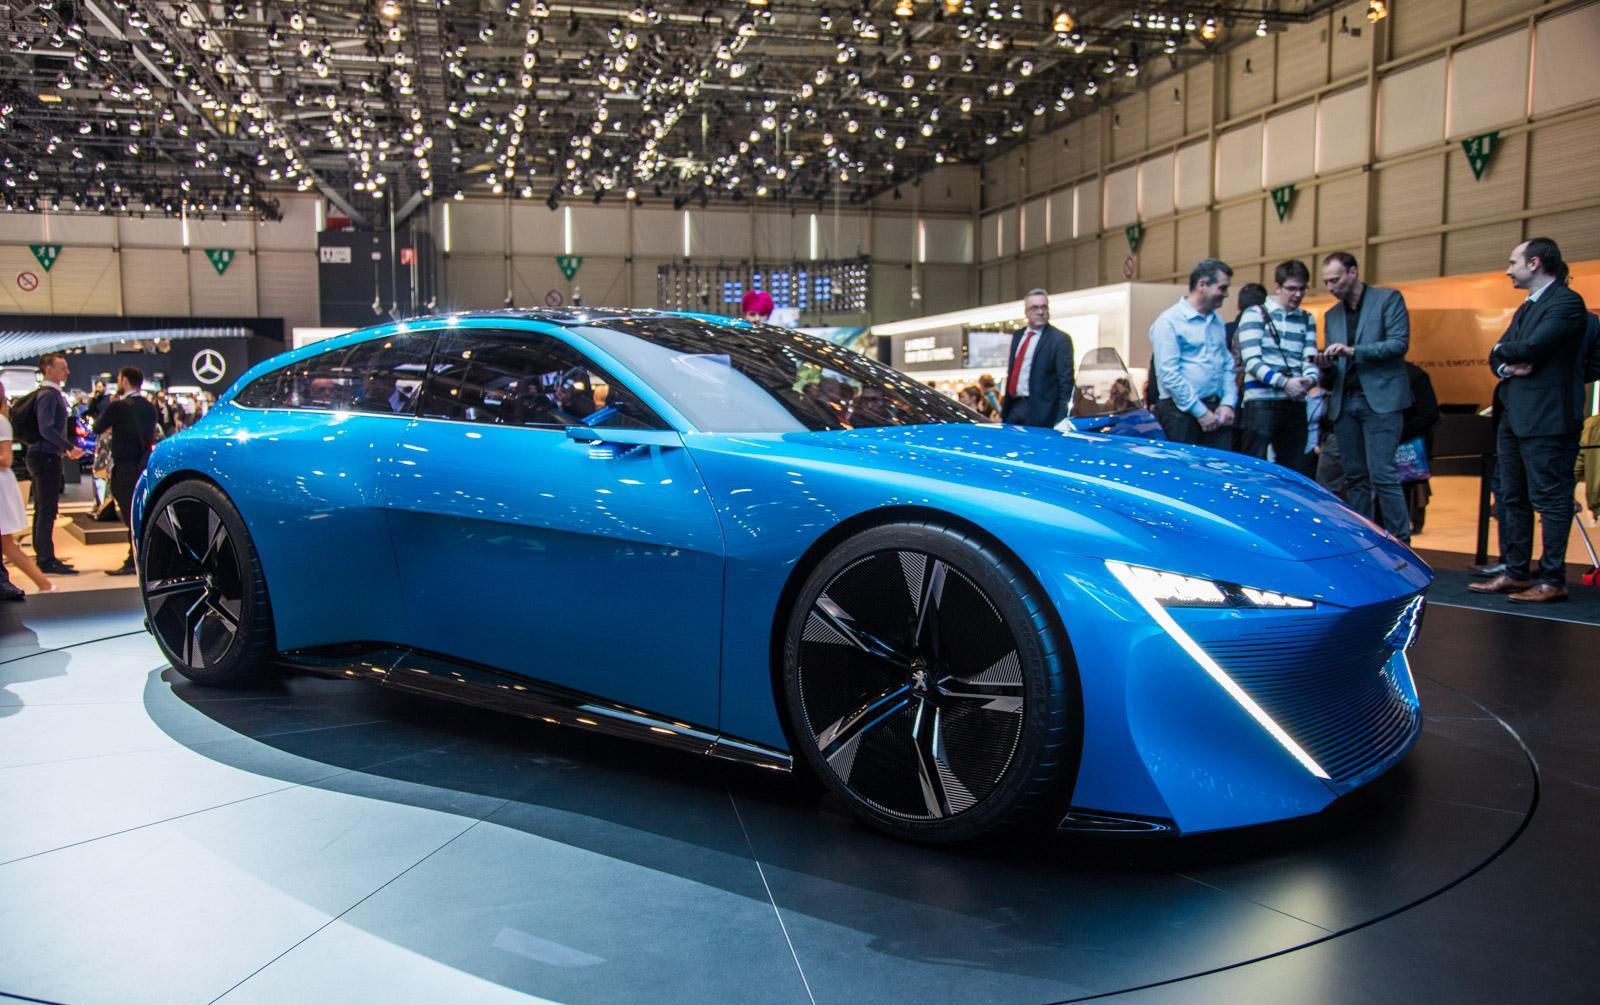 Peugeot-instinct-concept-001